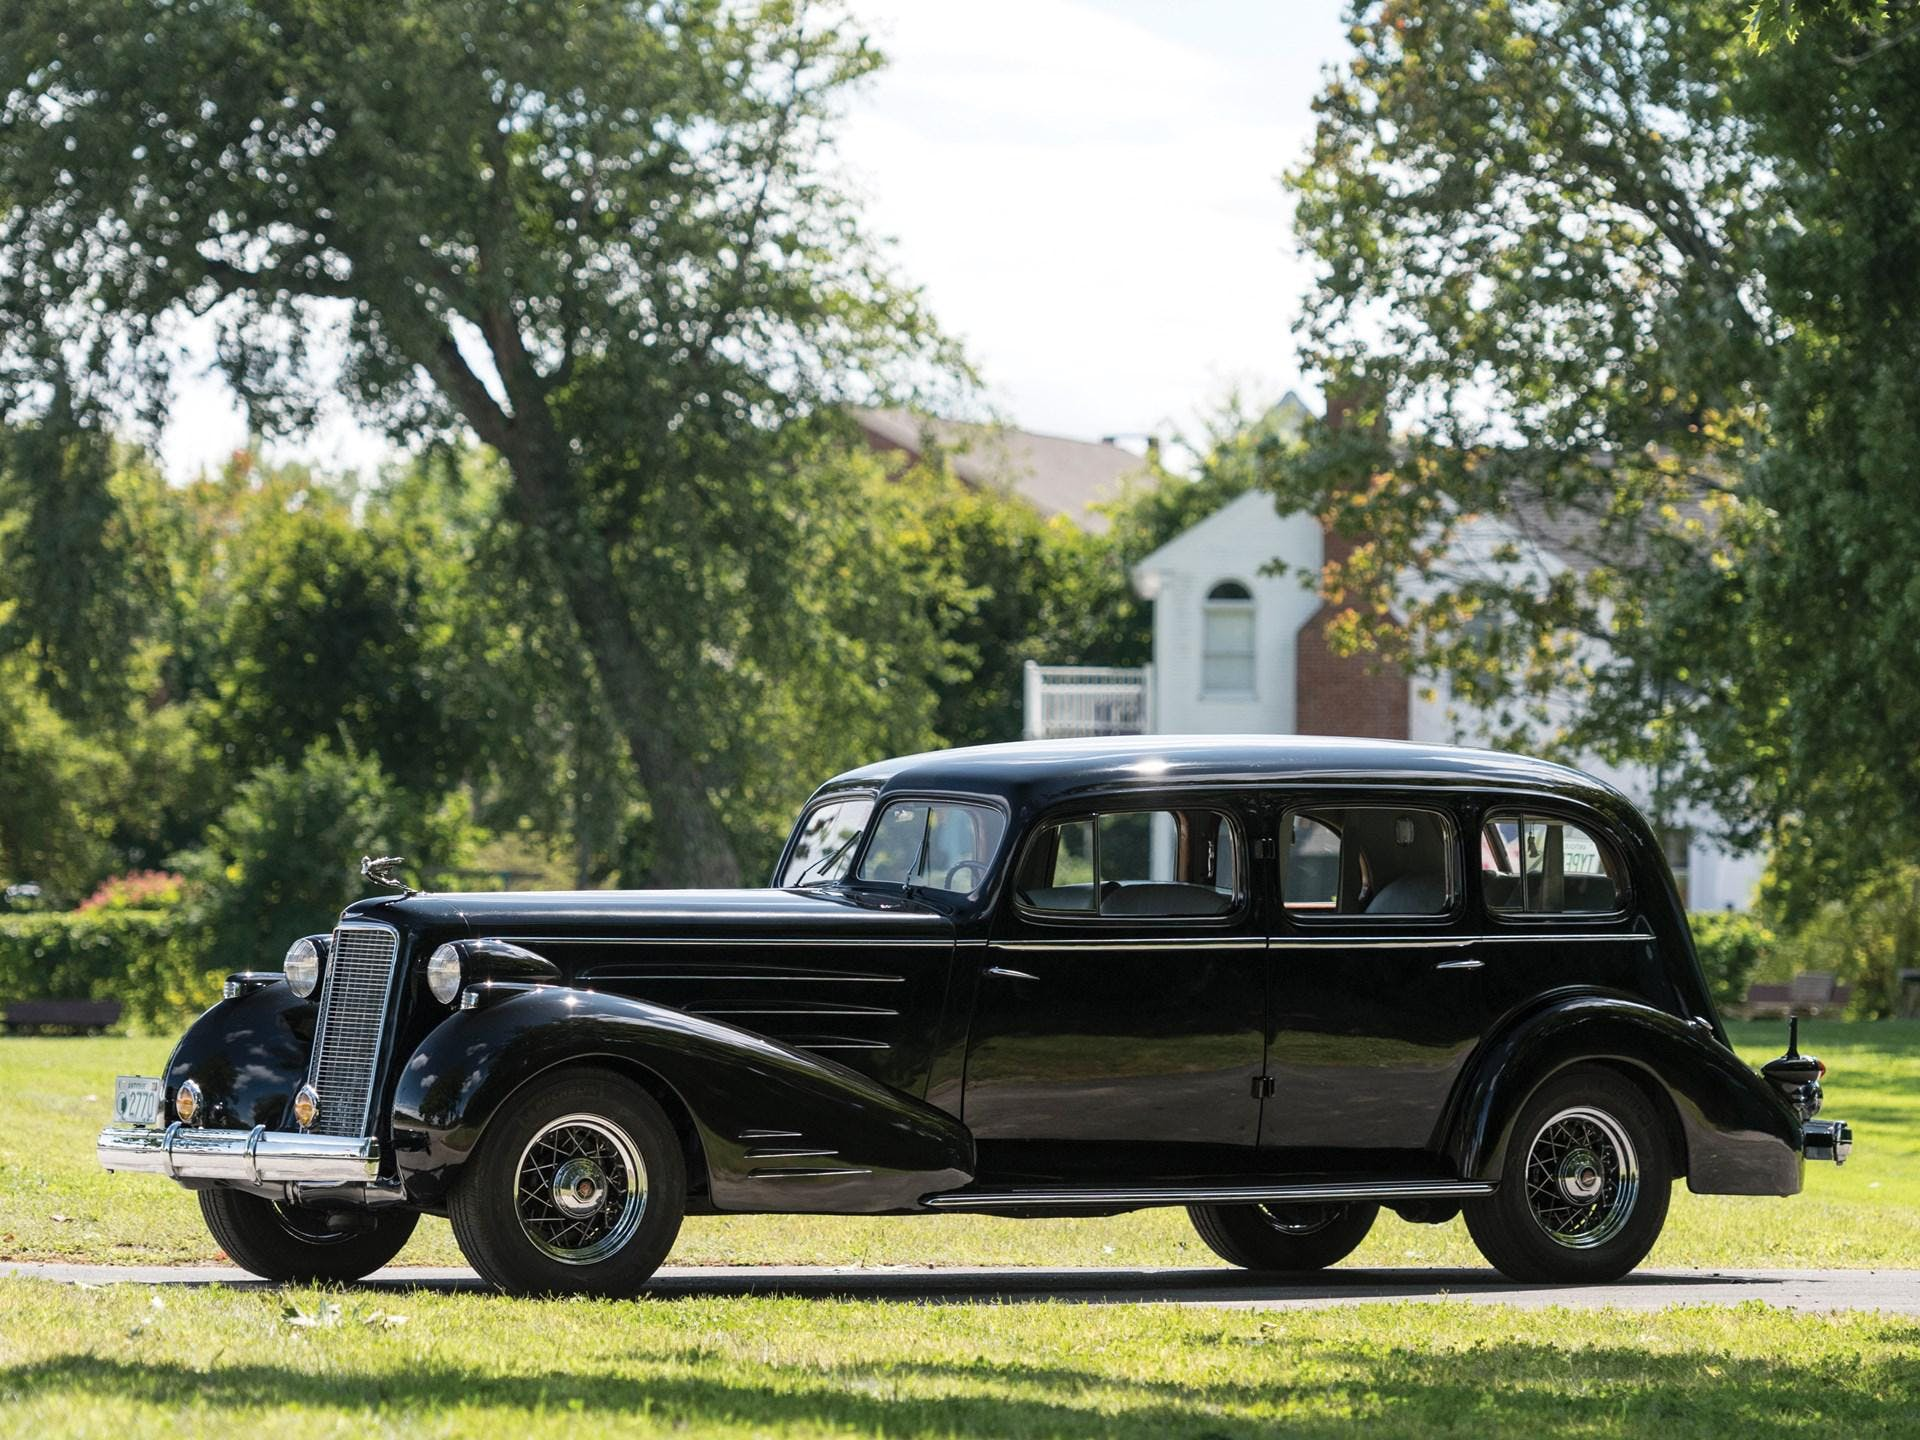 1937 Cadillac V-16 Seven-Passenger Limousine by Fleetwood